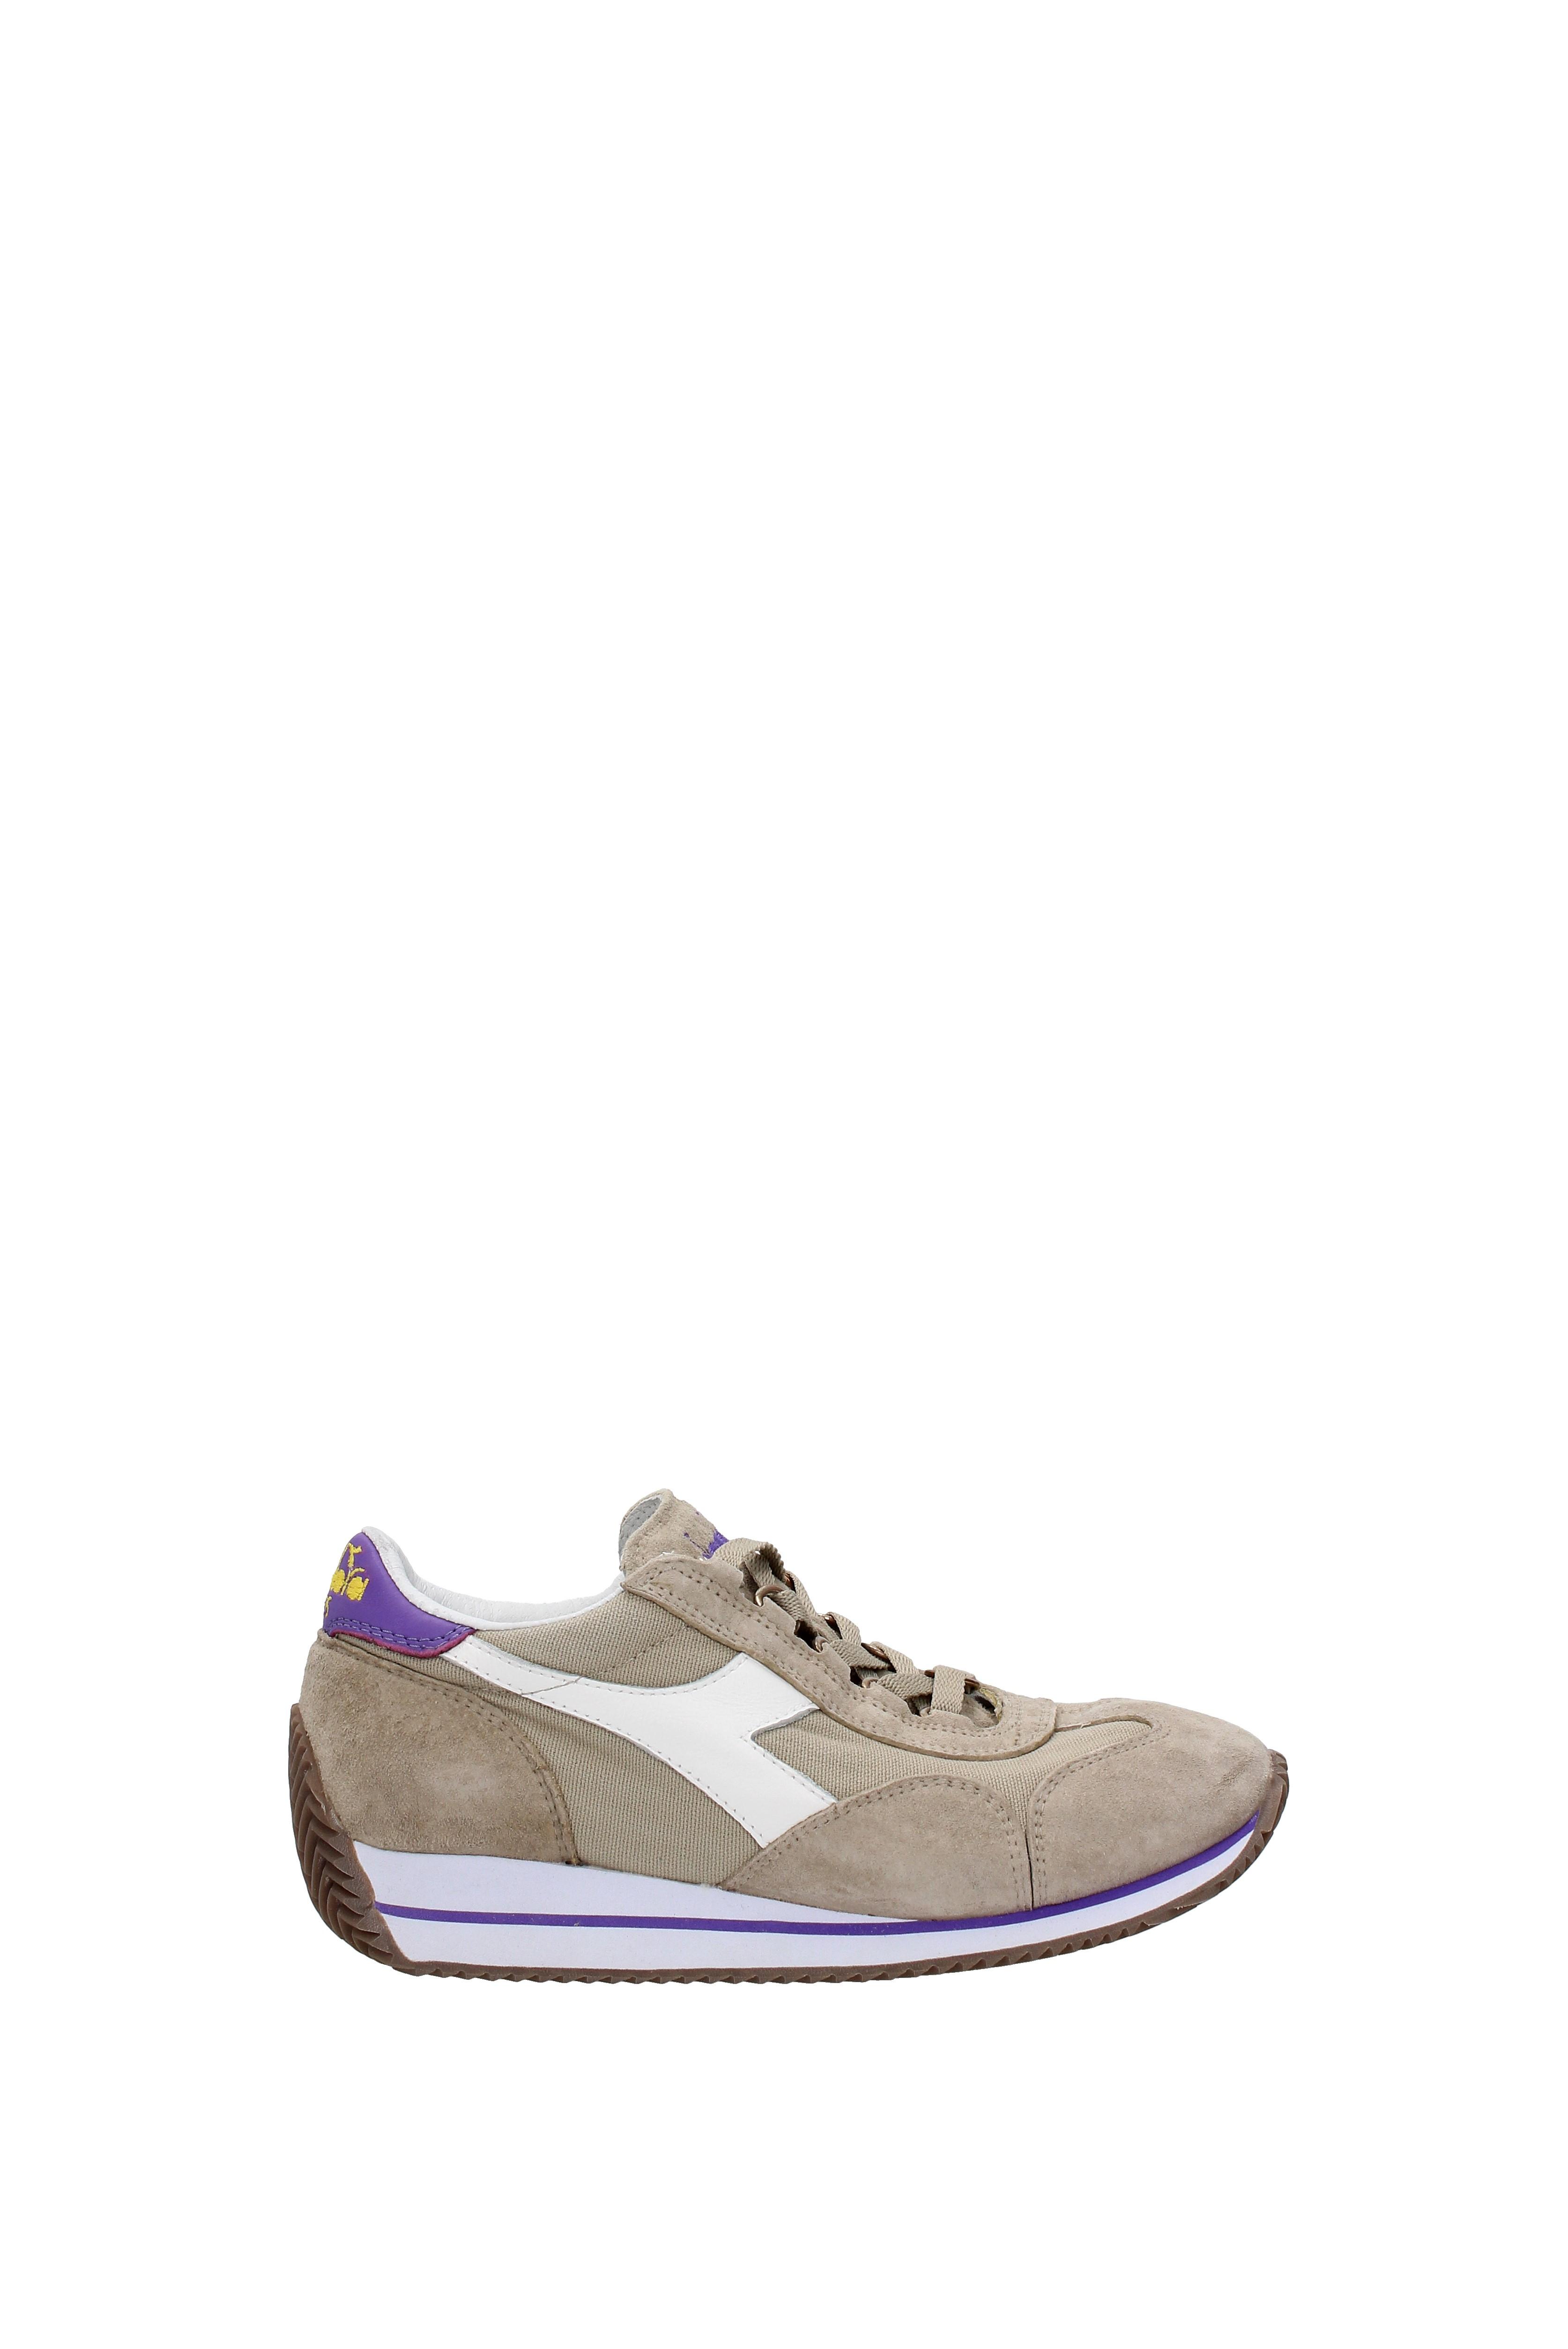 Sneakers-Diadora-Heritage-equipe-w-sw-hh-Women-Suede-20115603001